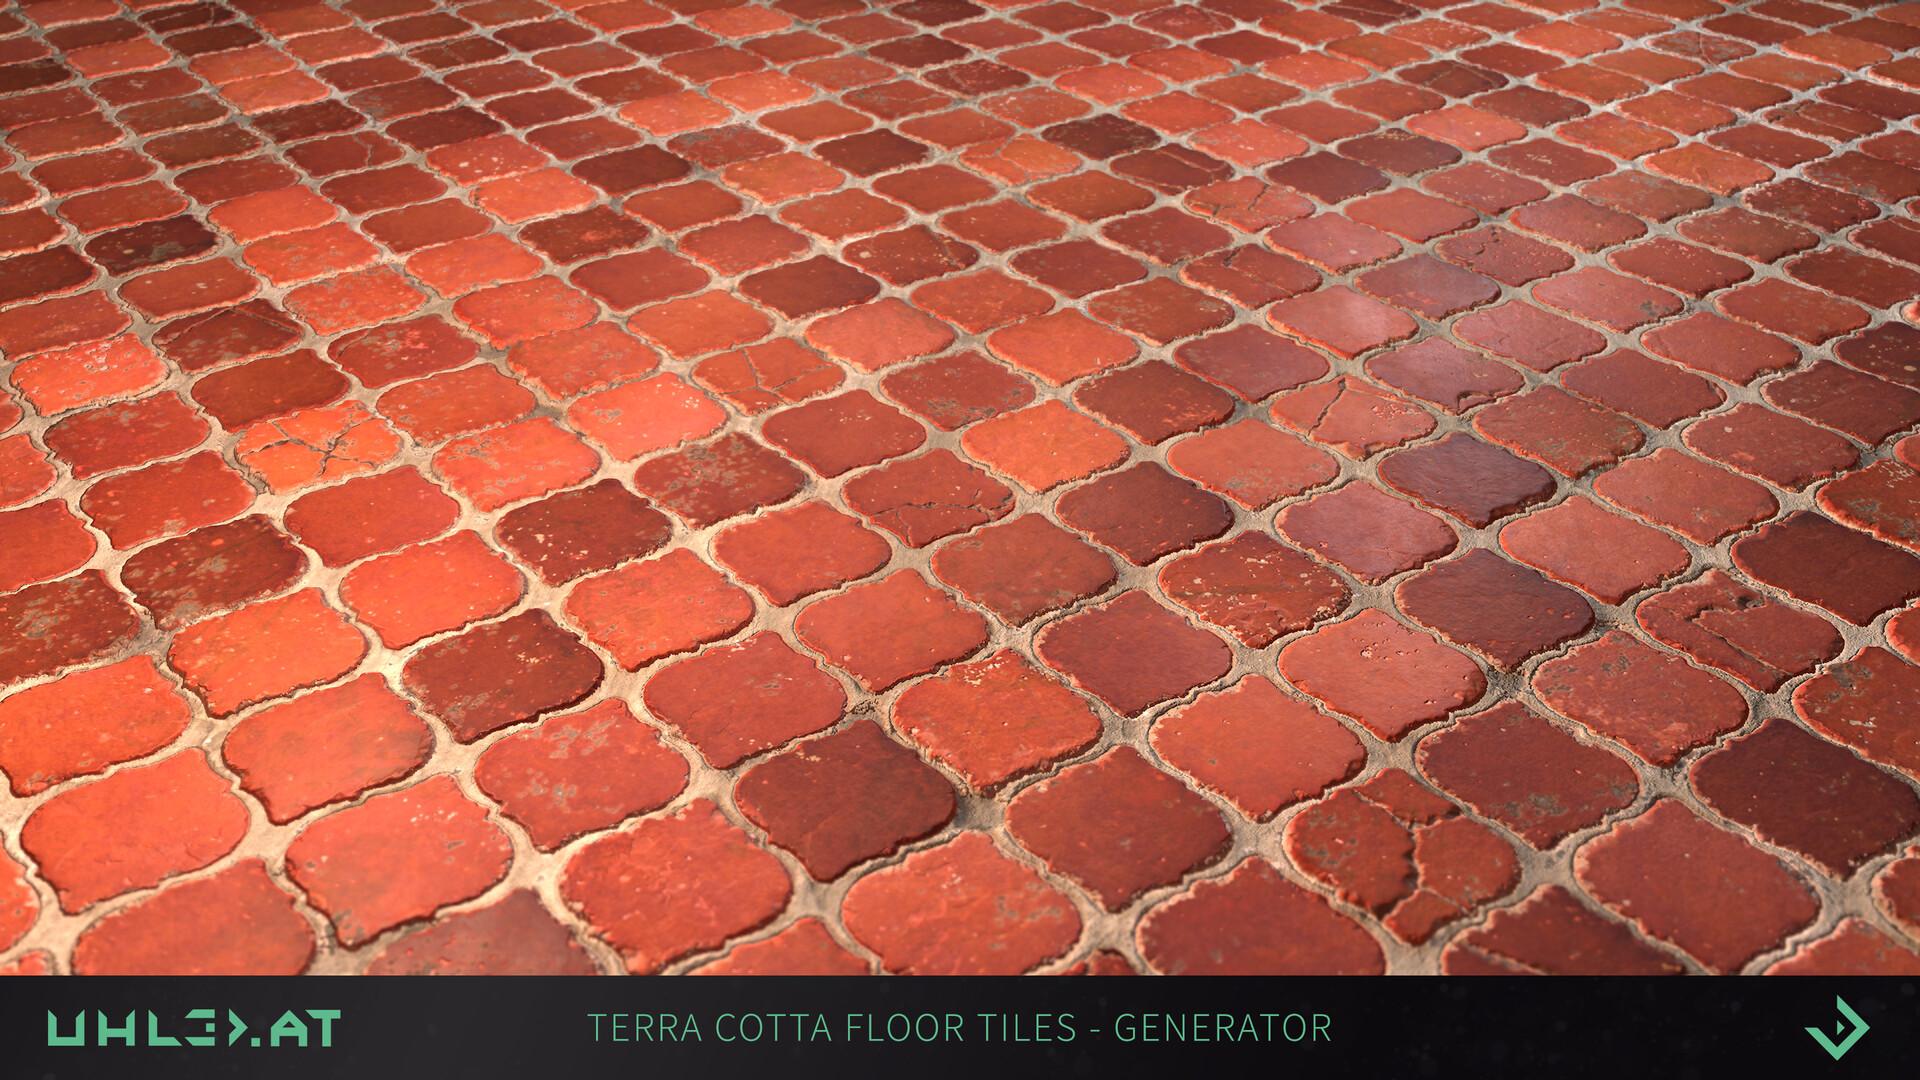 Dominik uhl terracottafloor generator detail 03